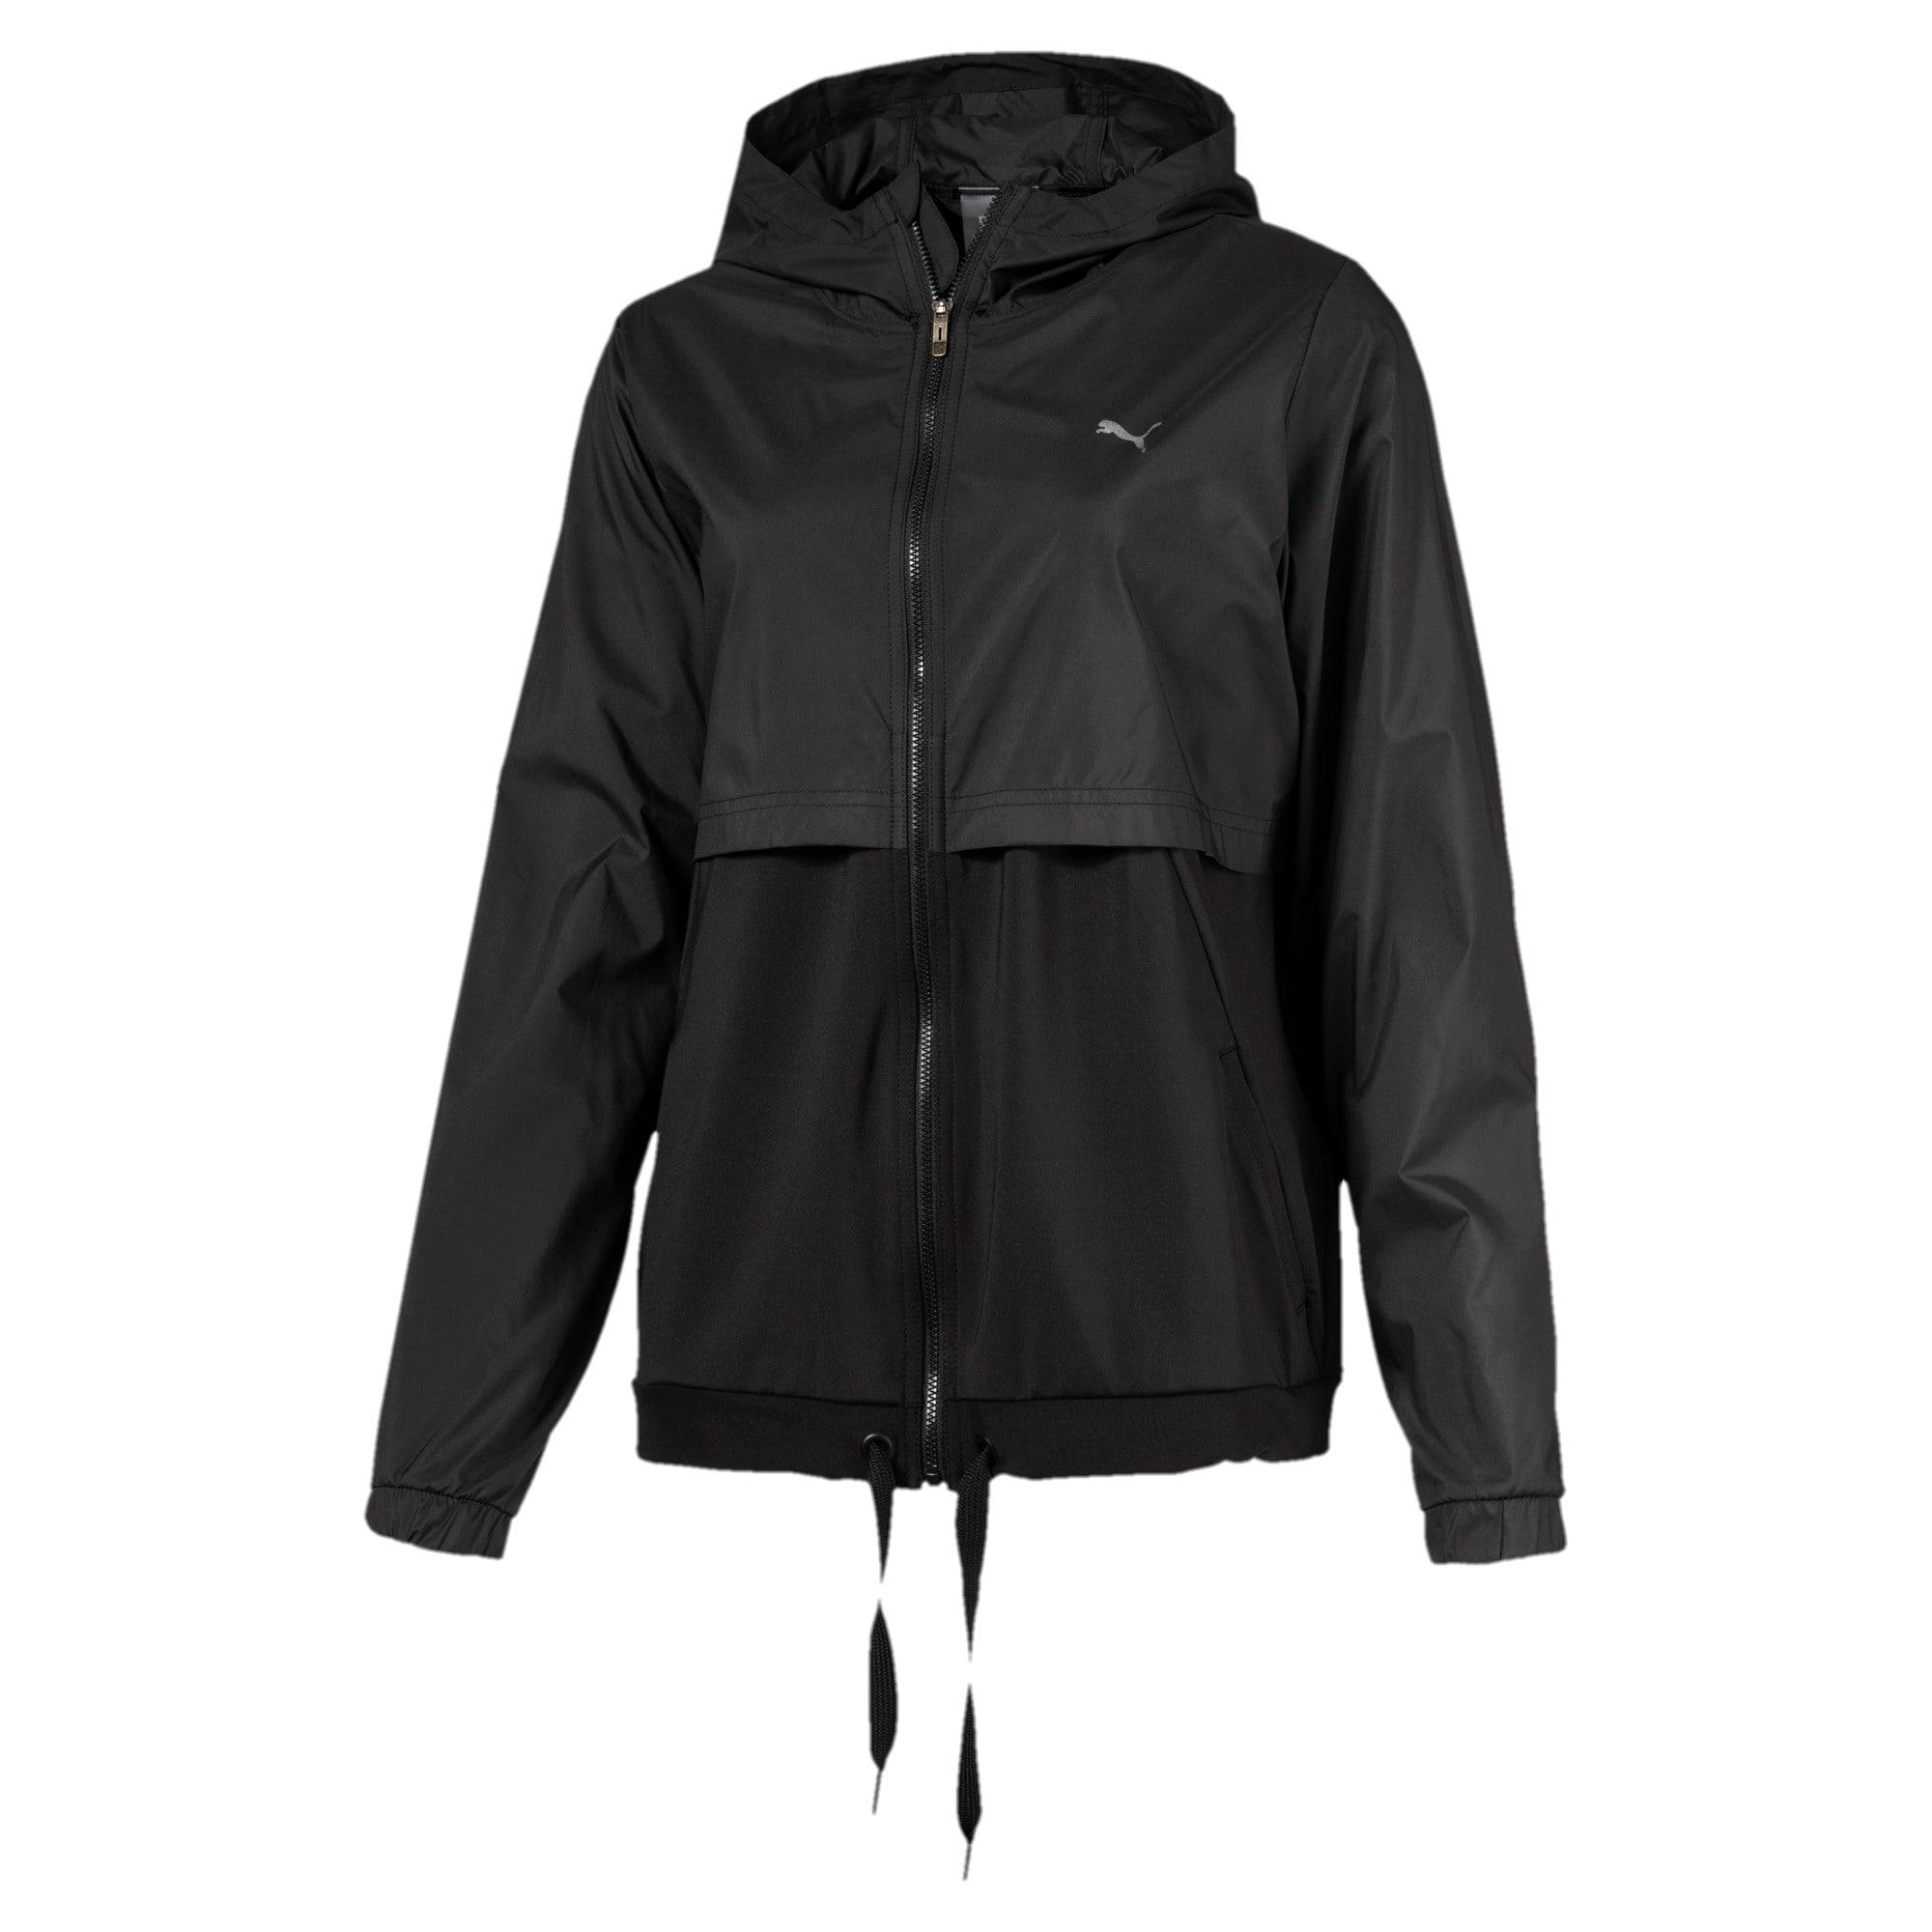 Thumbnail 1 of A.C.E. Train It Women's Training Jacket, Puma Black, medium